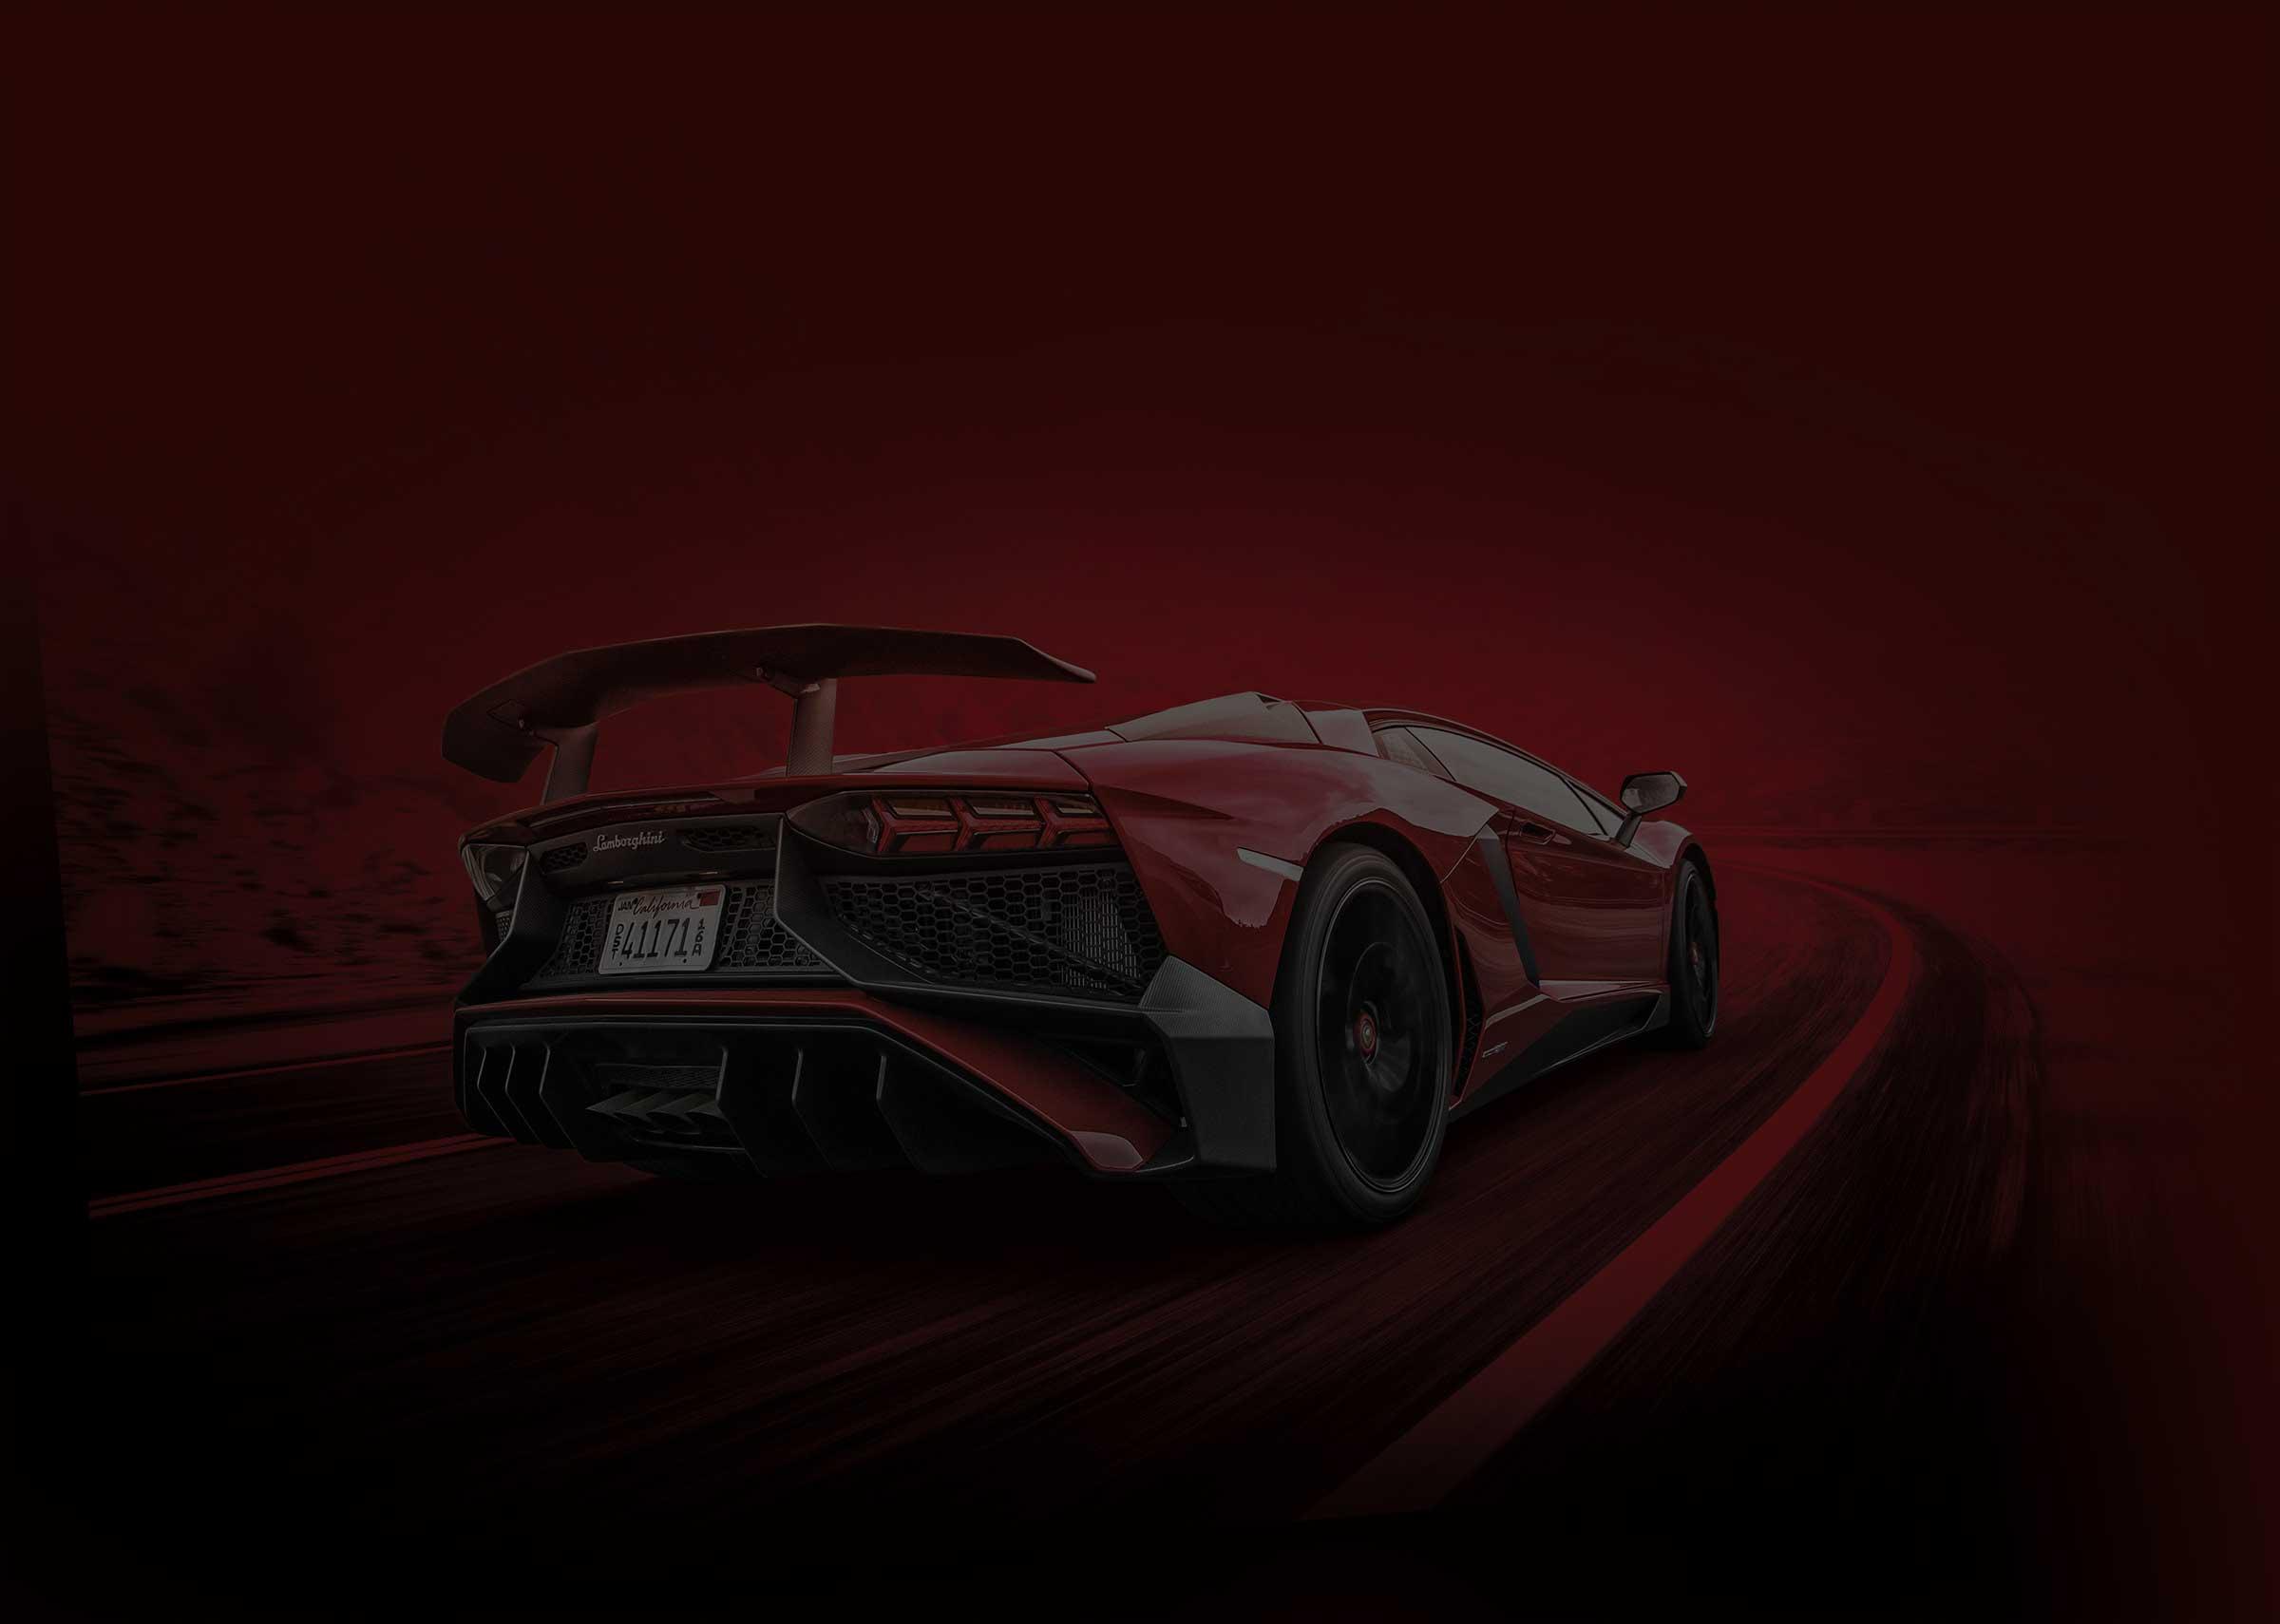 Motor Trend Watch Auto Shows Motorsports Online All New Beat Sporty Esp Cbs Tecno Blue White Salatiga